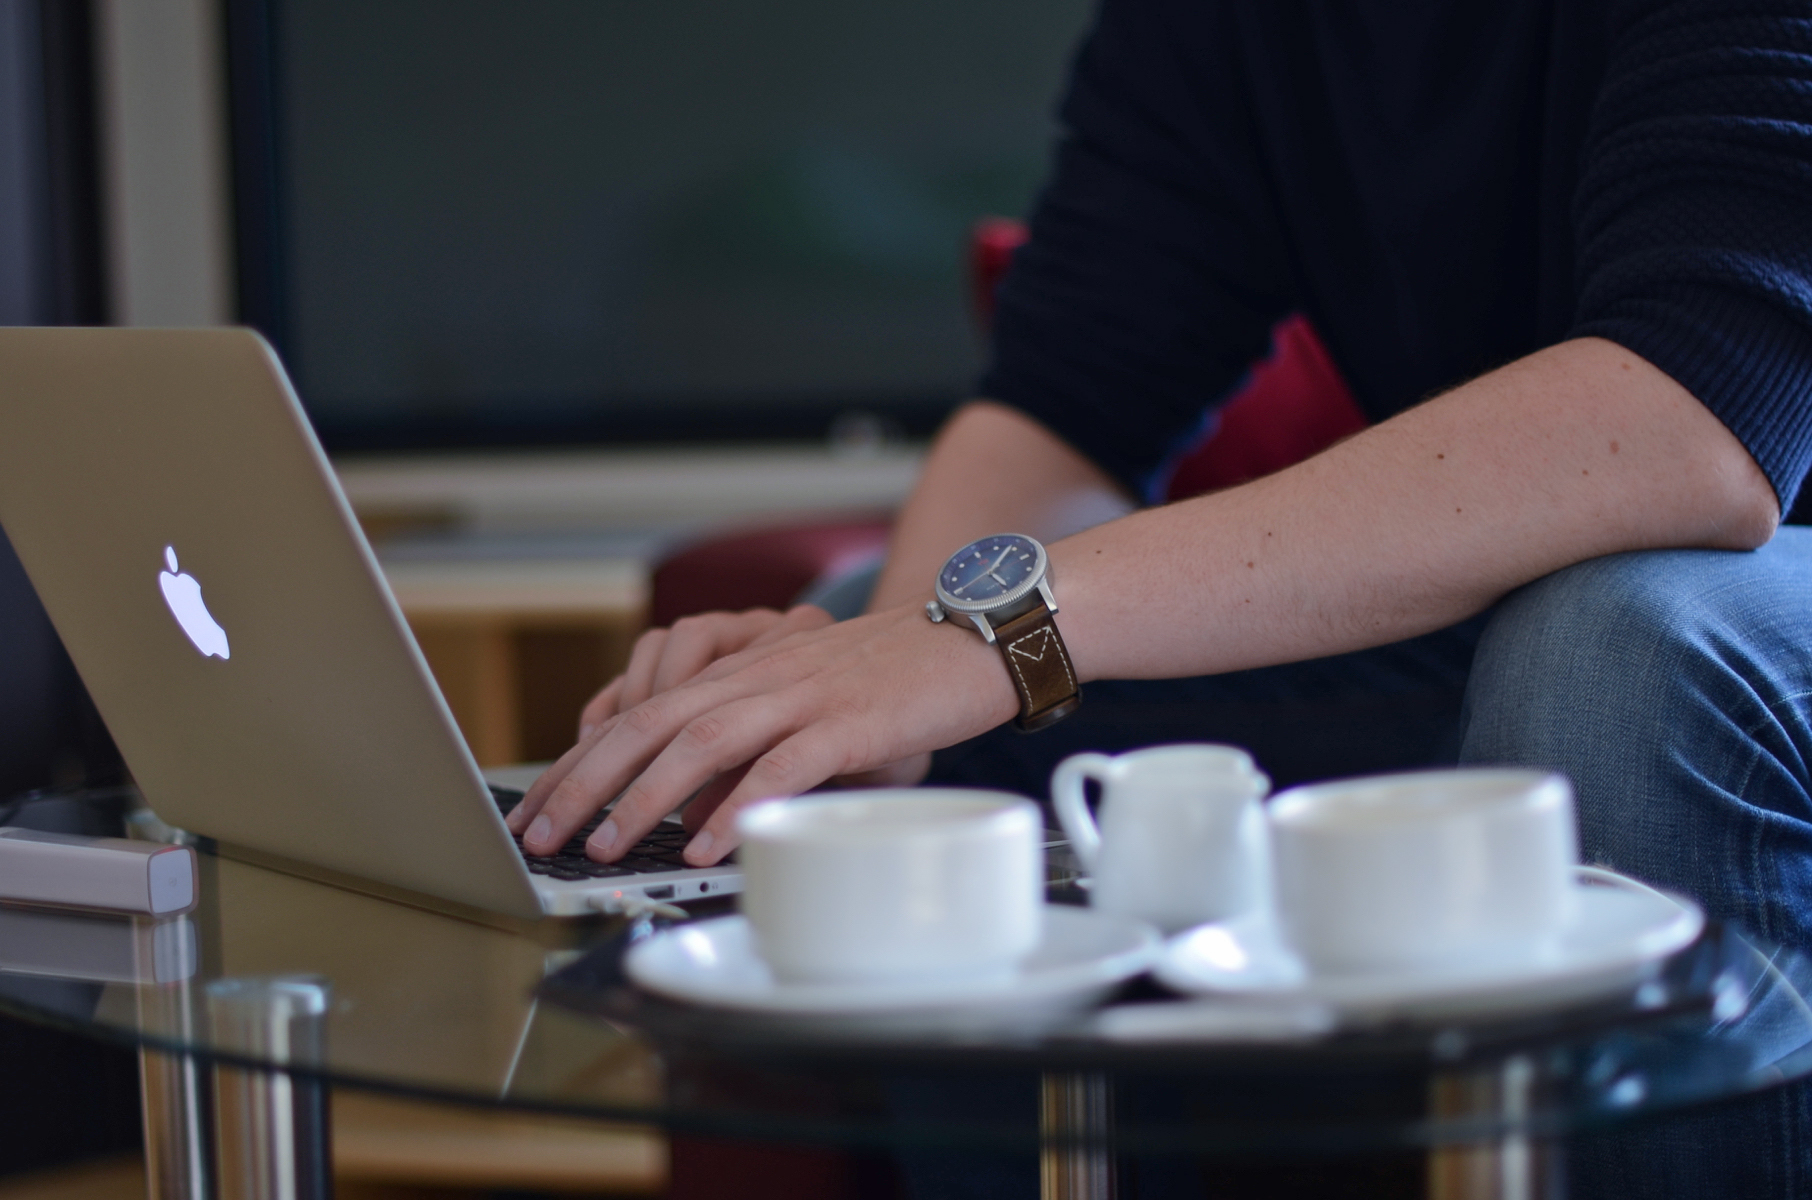 bloger work